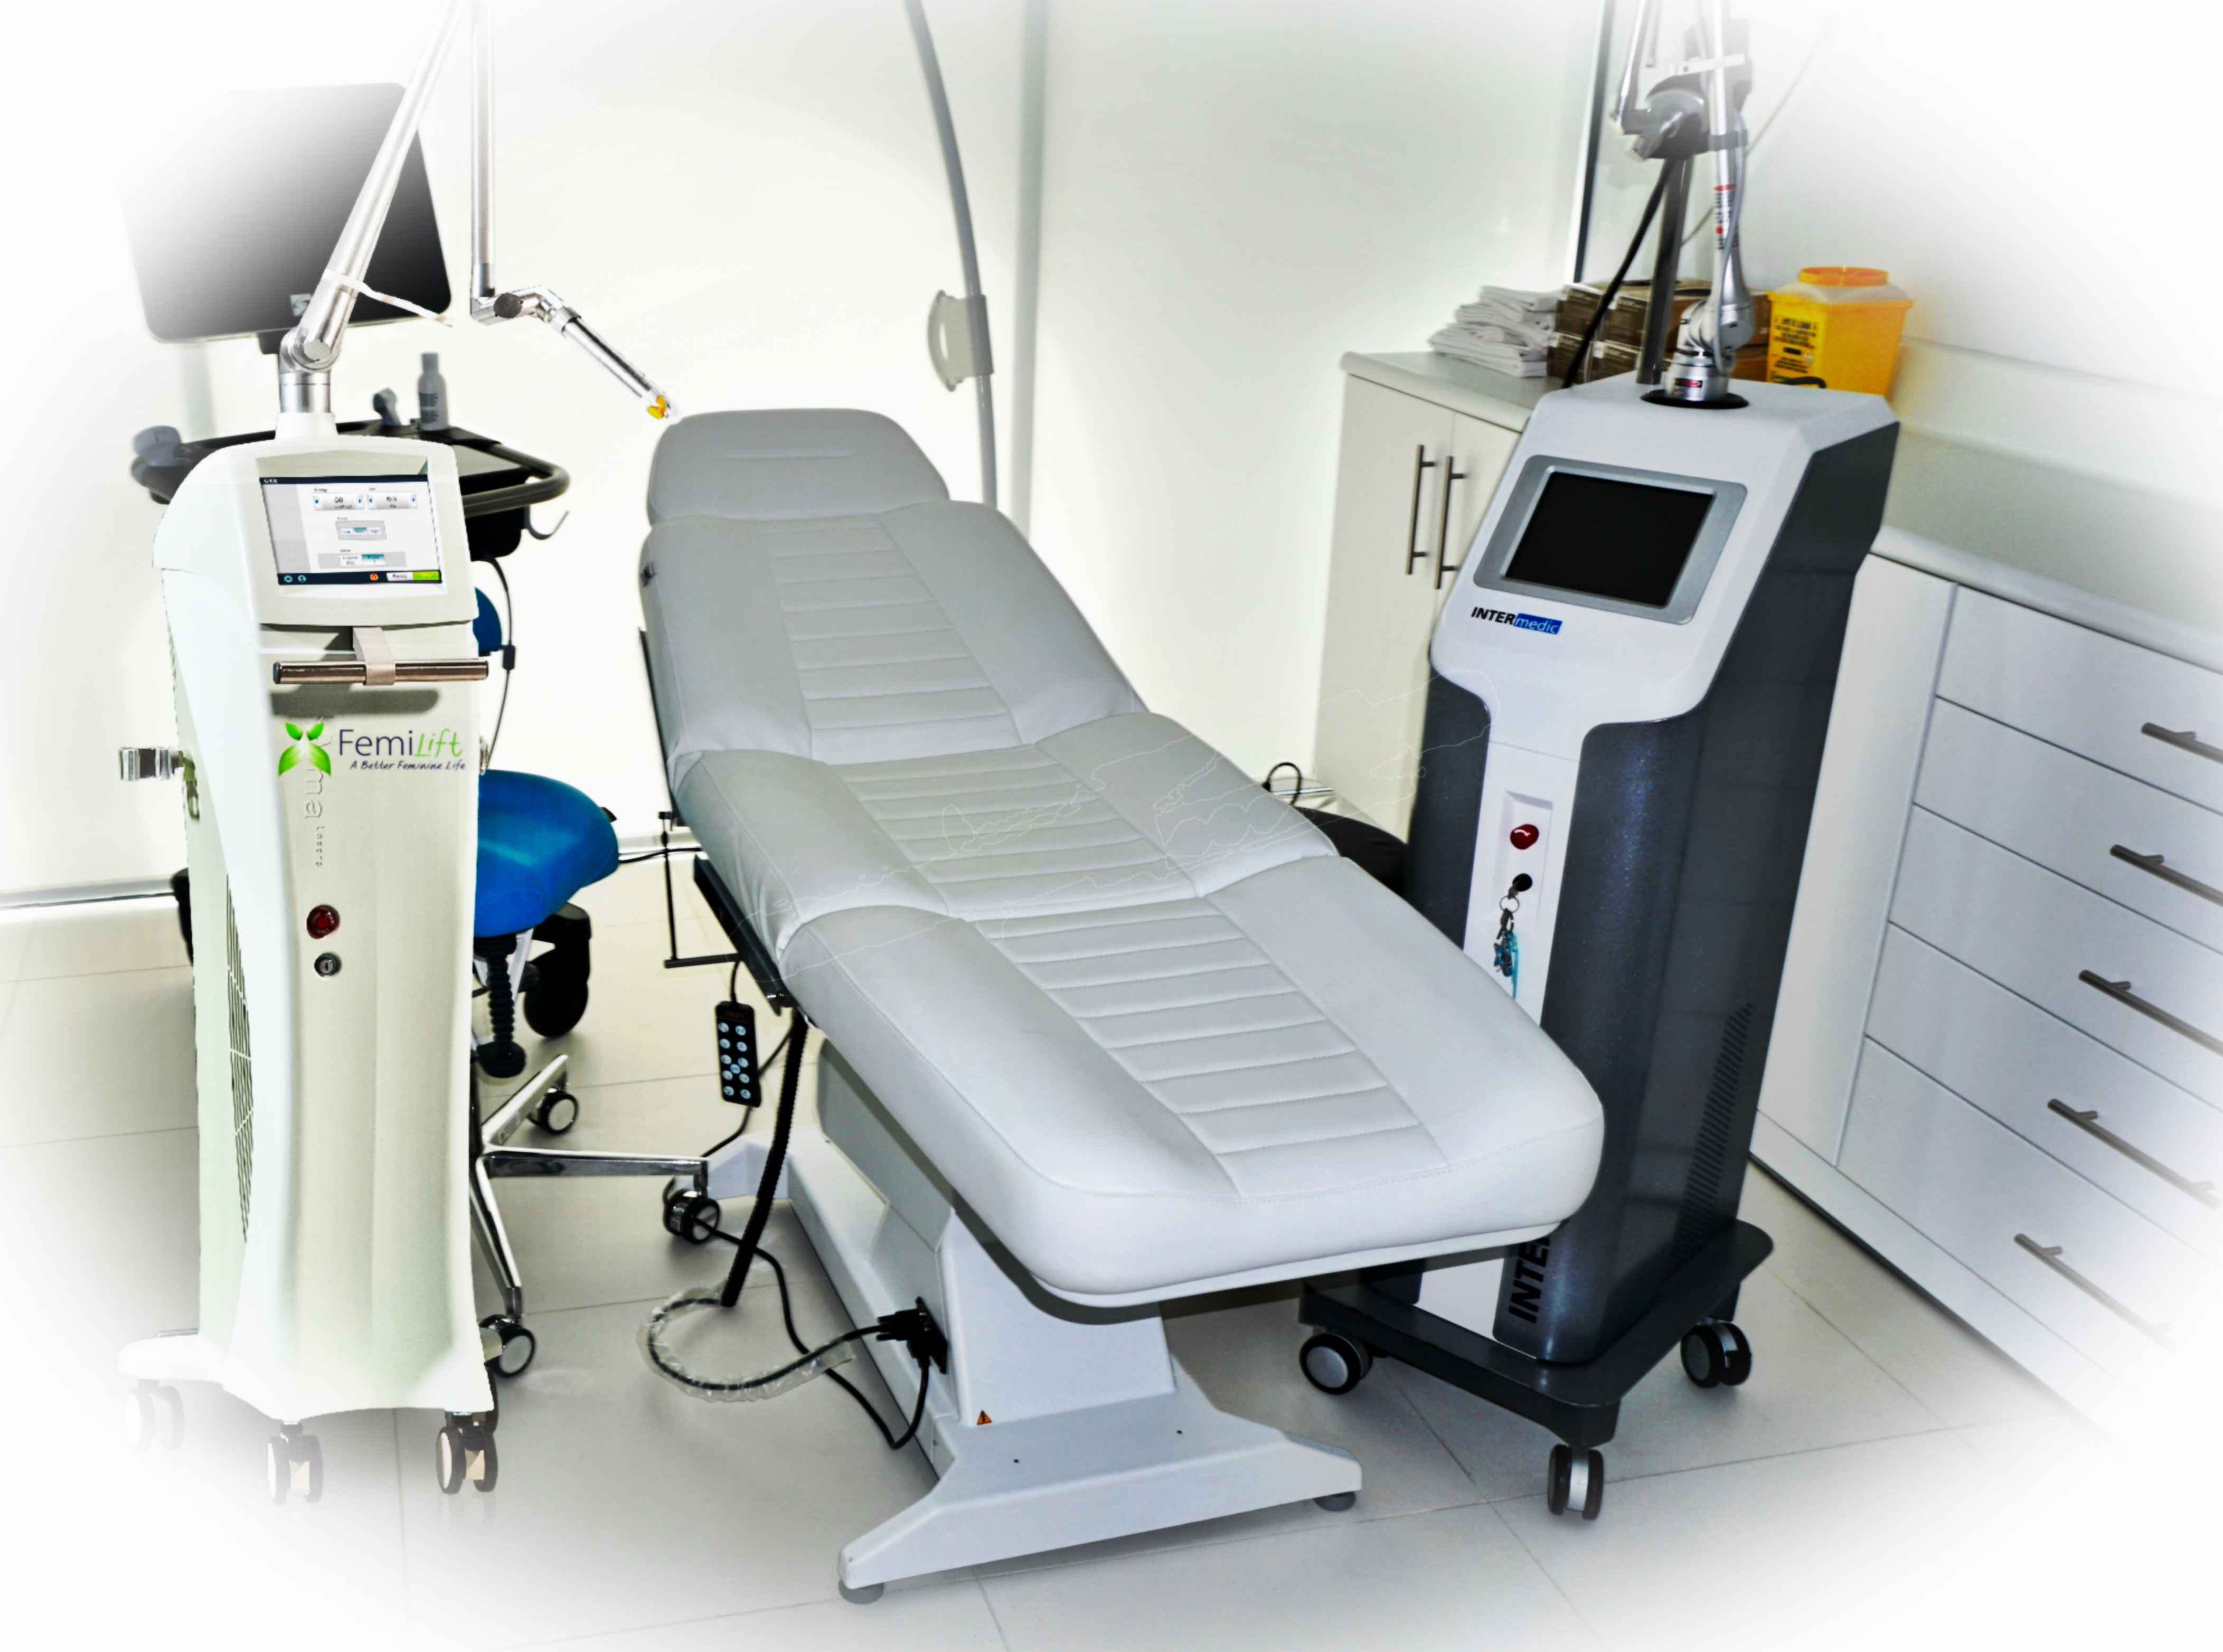 FemiLift Gynecological Treatments